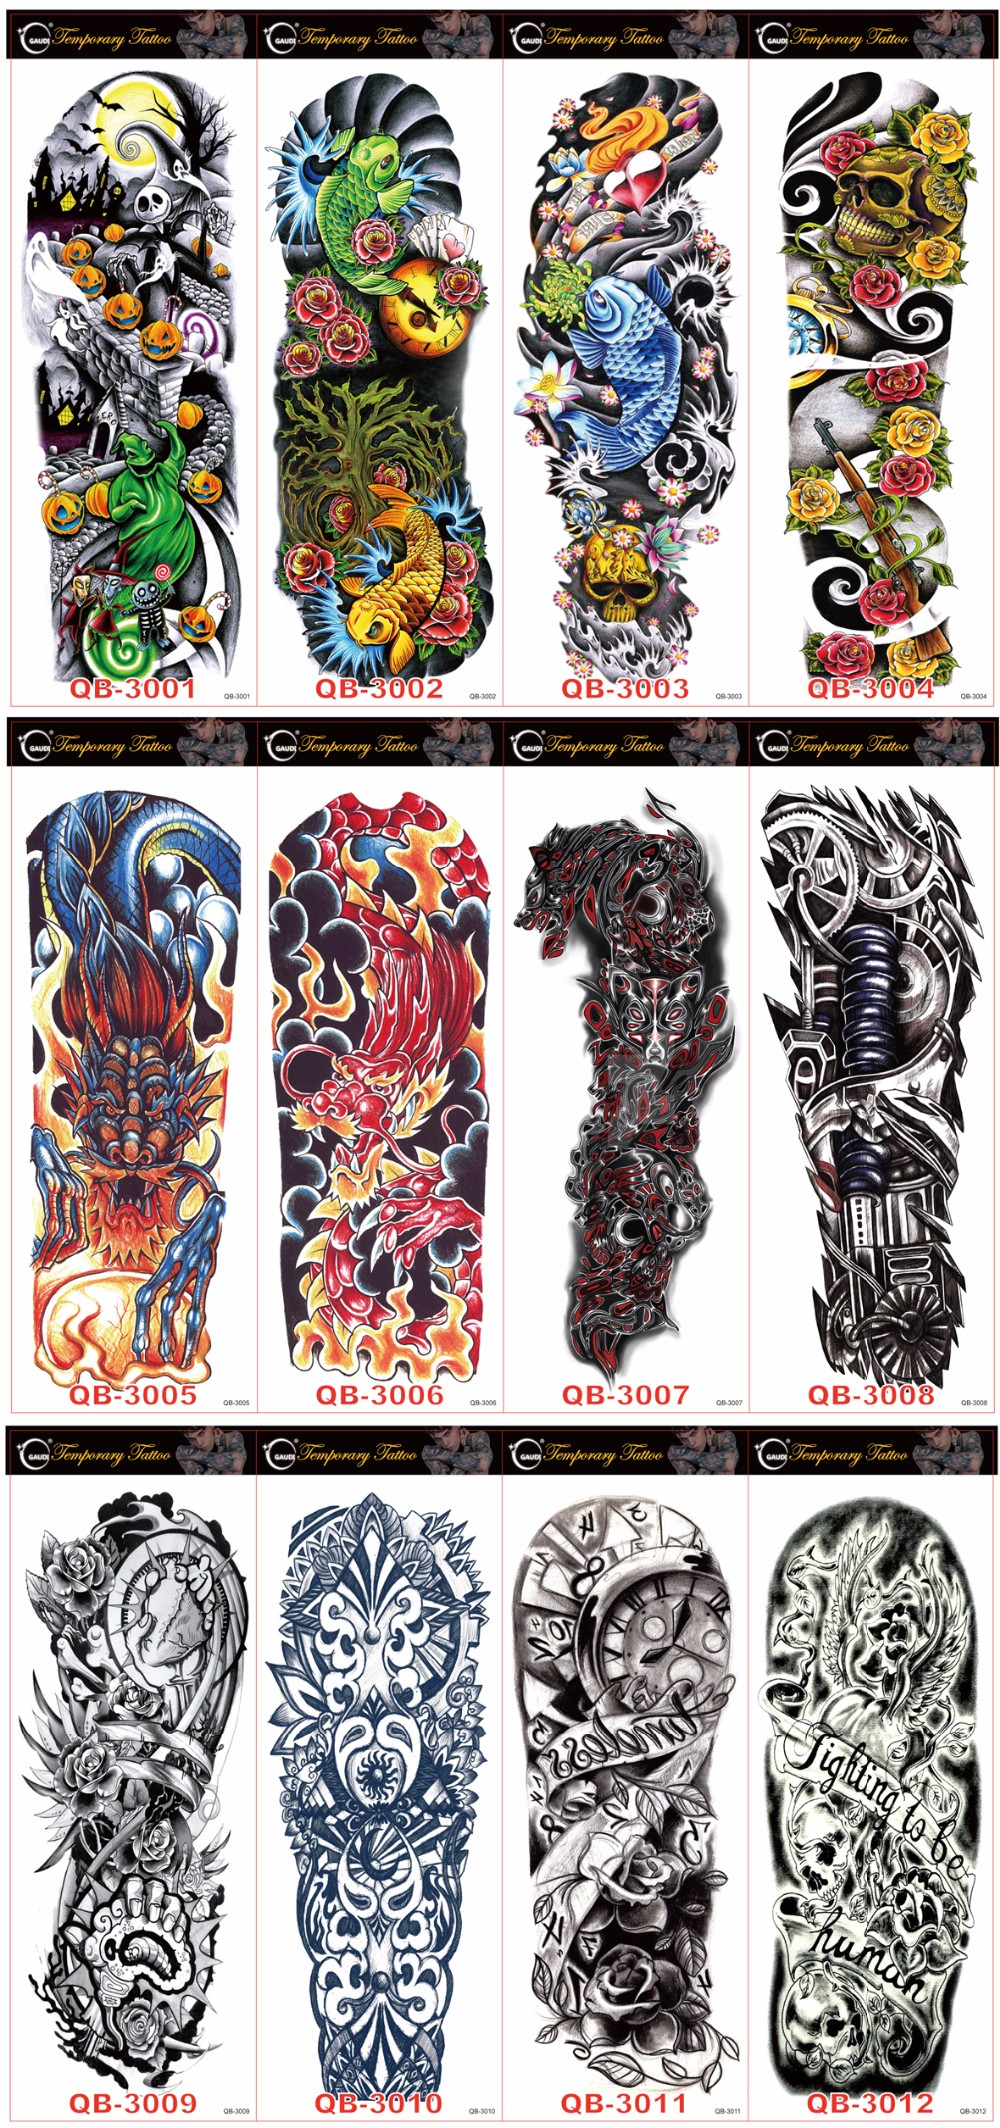 Waterproof Temporary Tattoo Sticker full arm large size robot arm tatto flash tatoo fake tattoos sleeve for men women 19 3